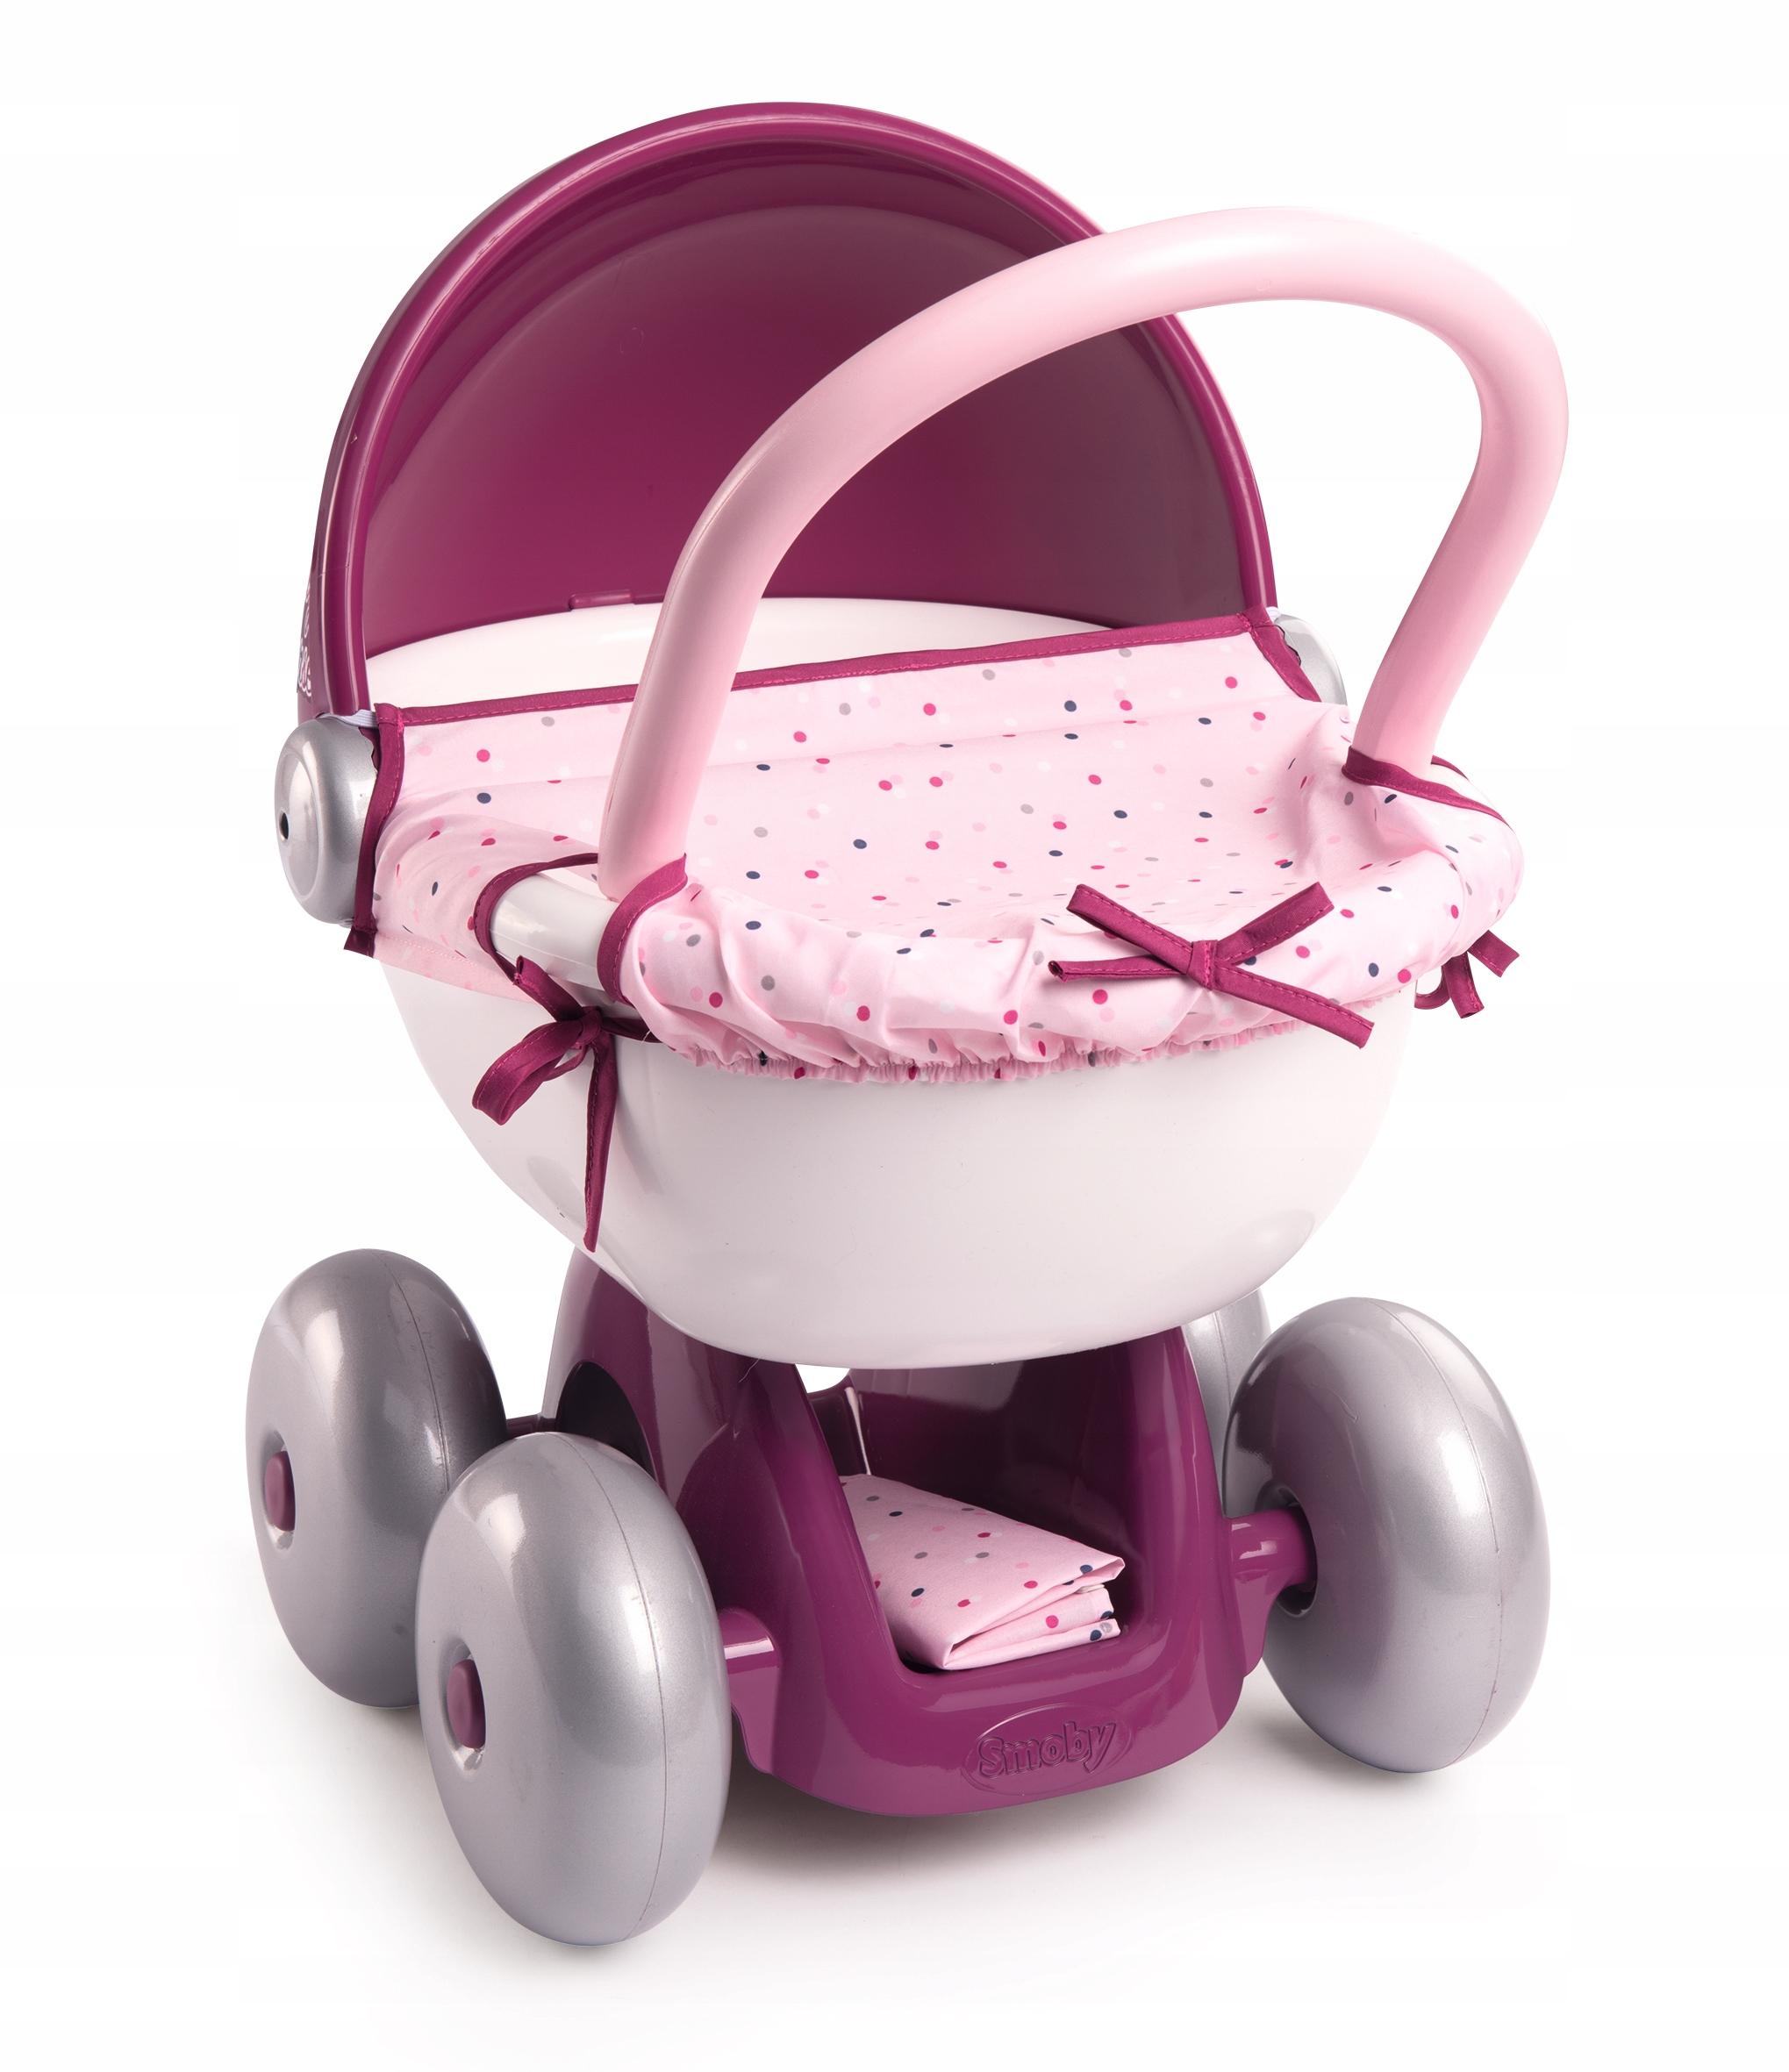 Smoby - Baby Nurse - Pram (I-7220348)